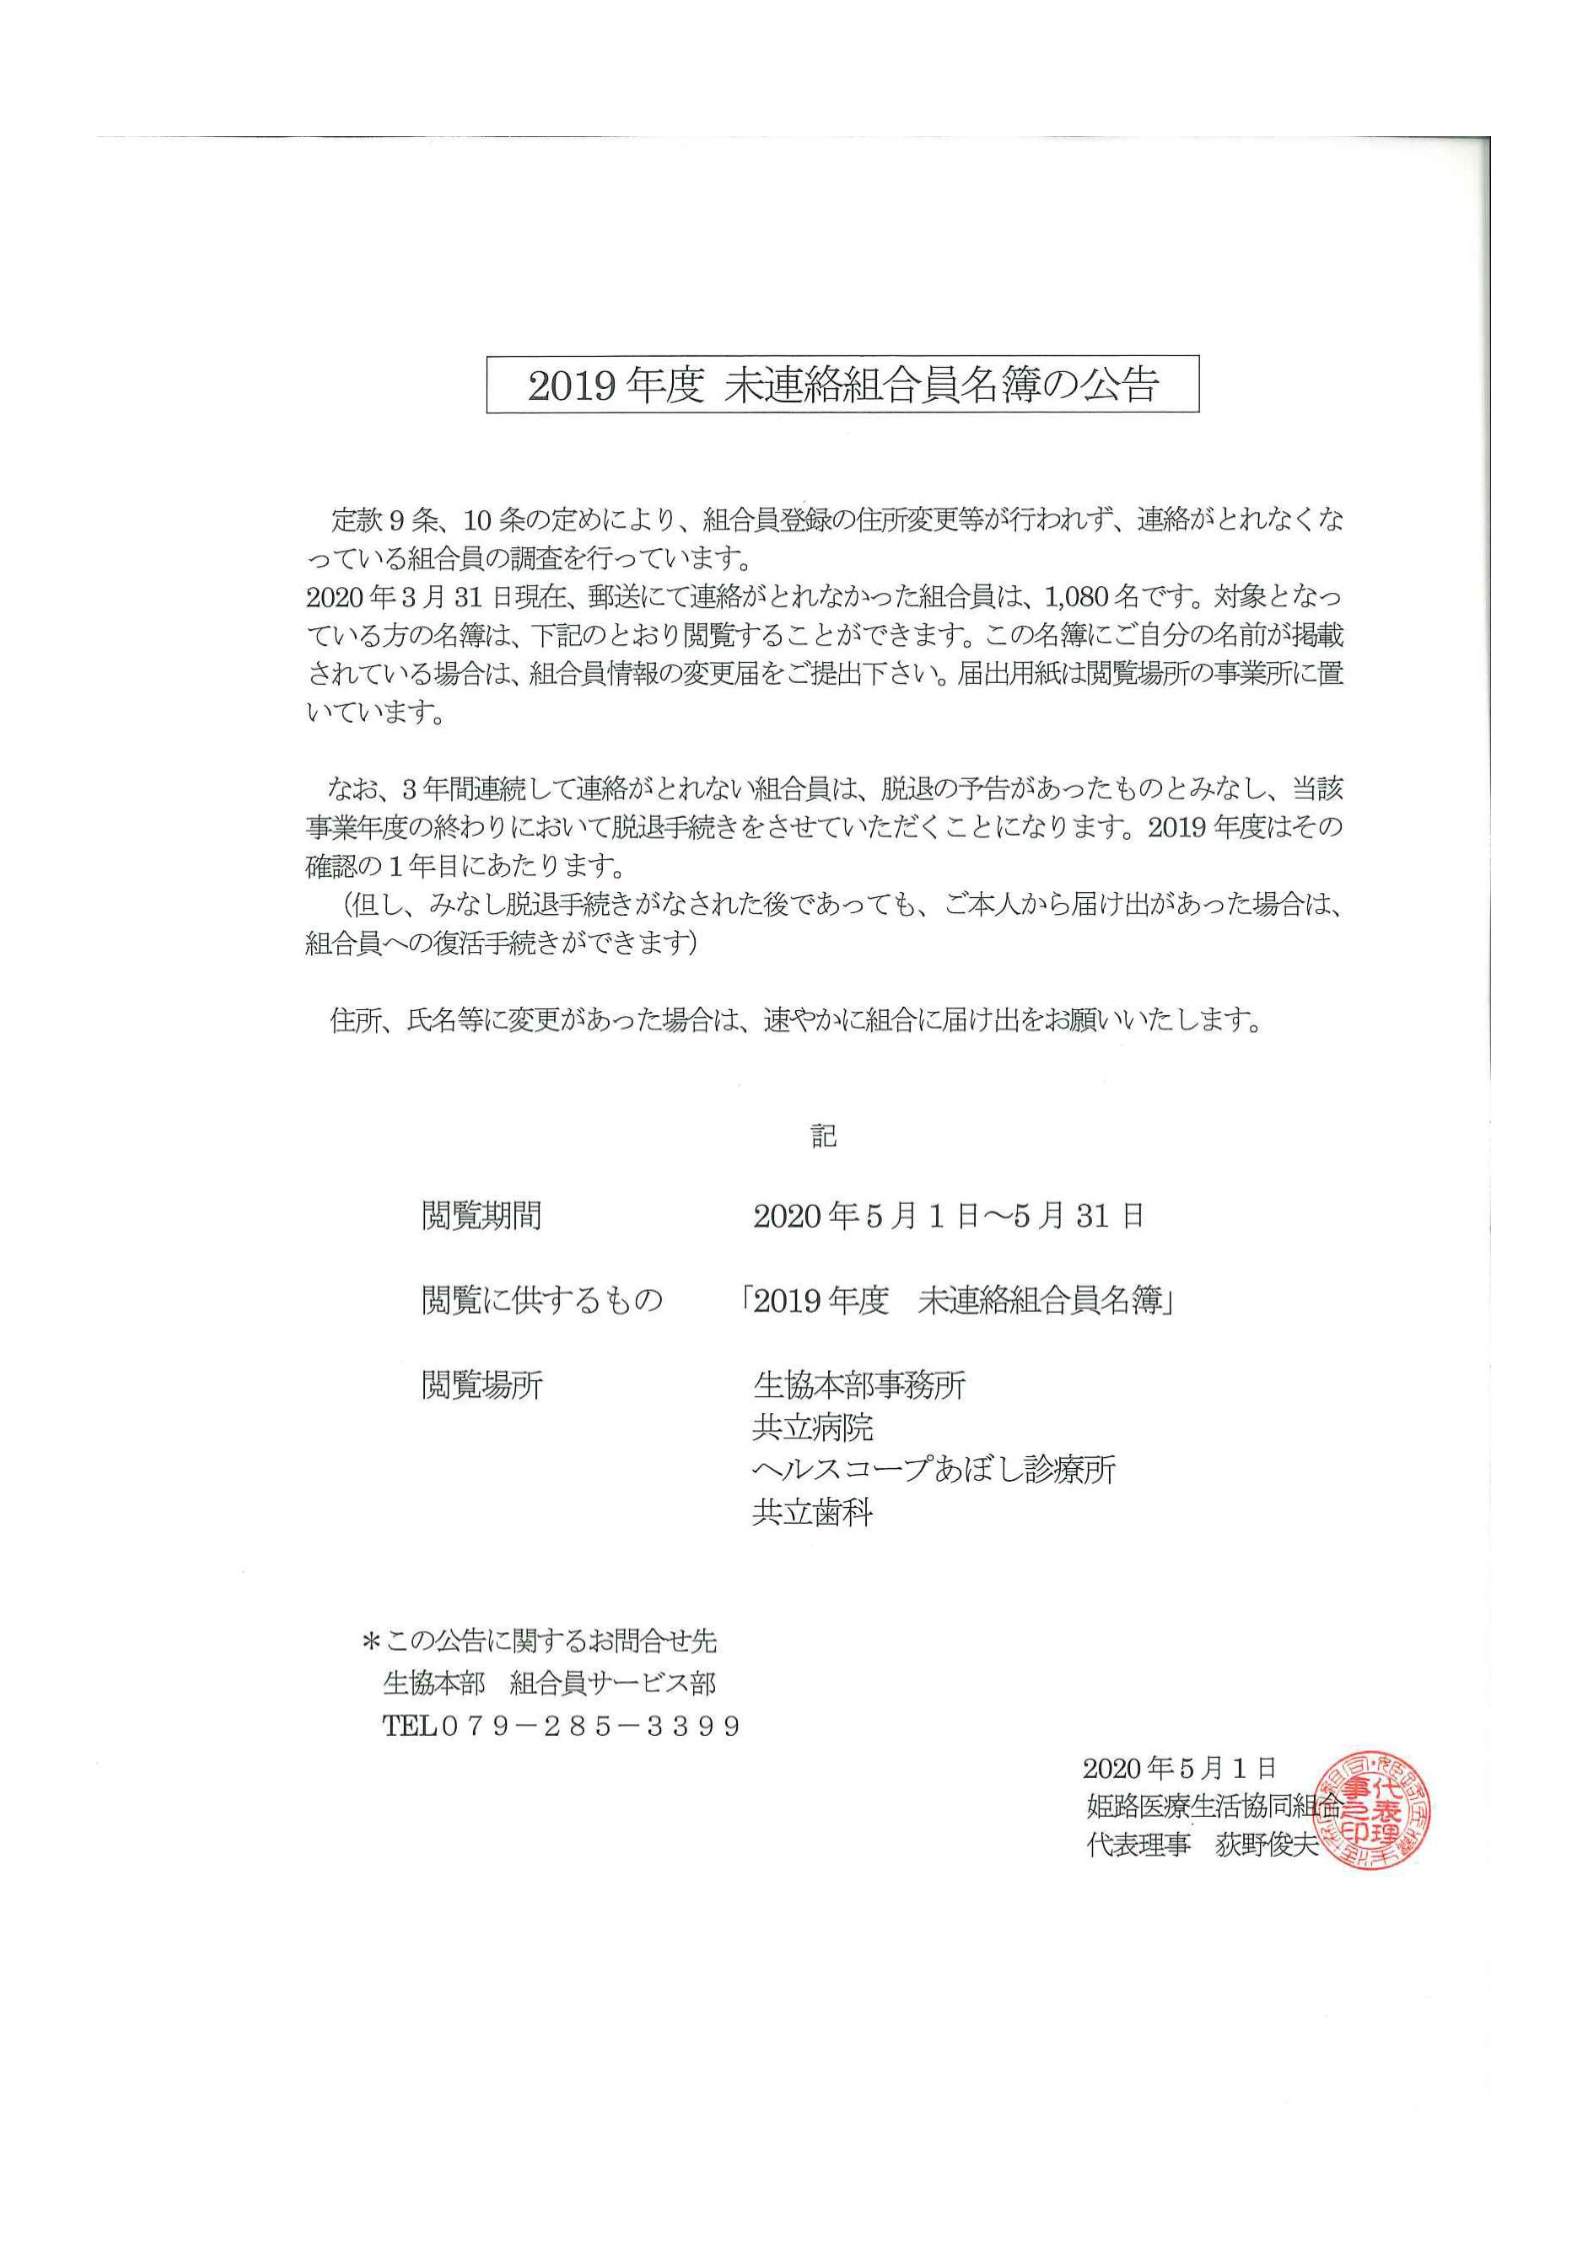 2019年度 未連絡組合員名簿の公告